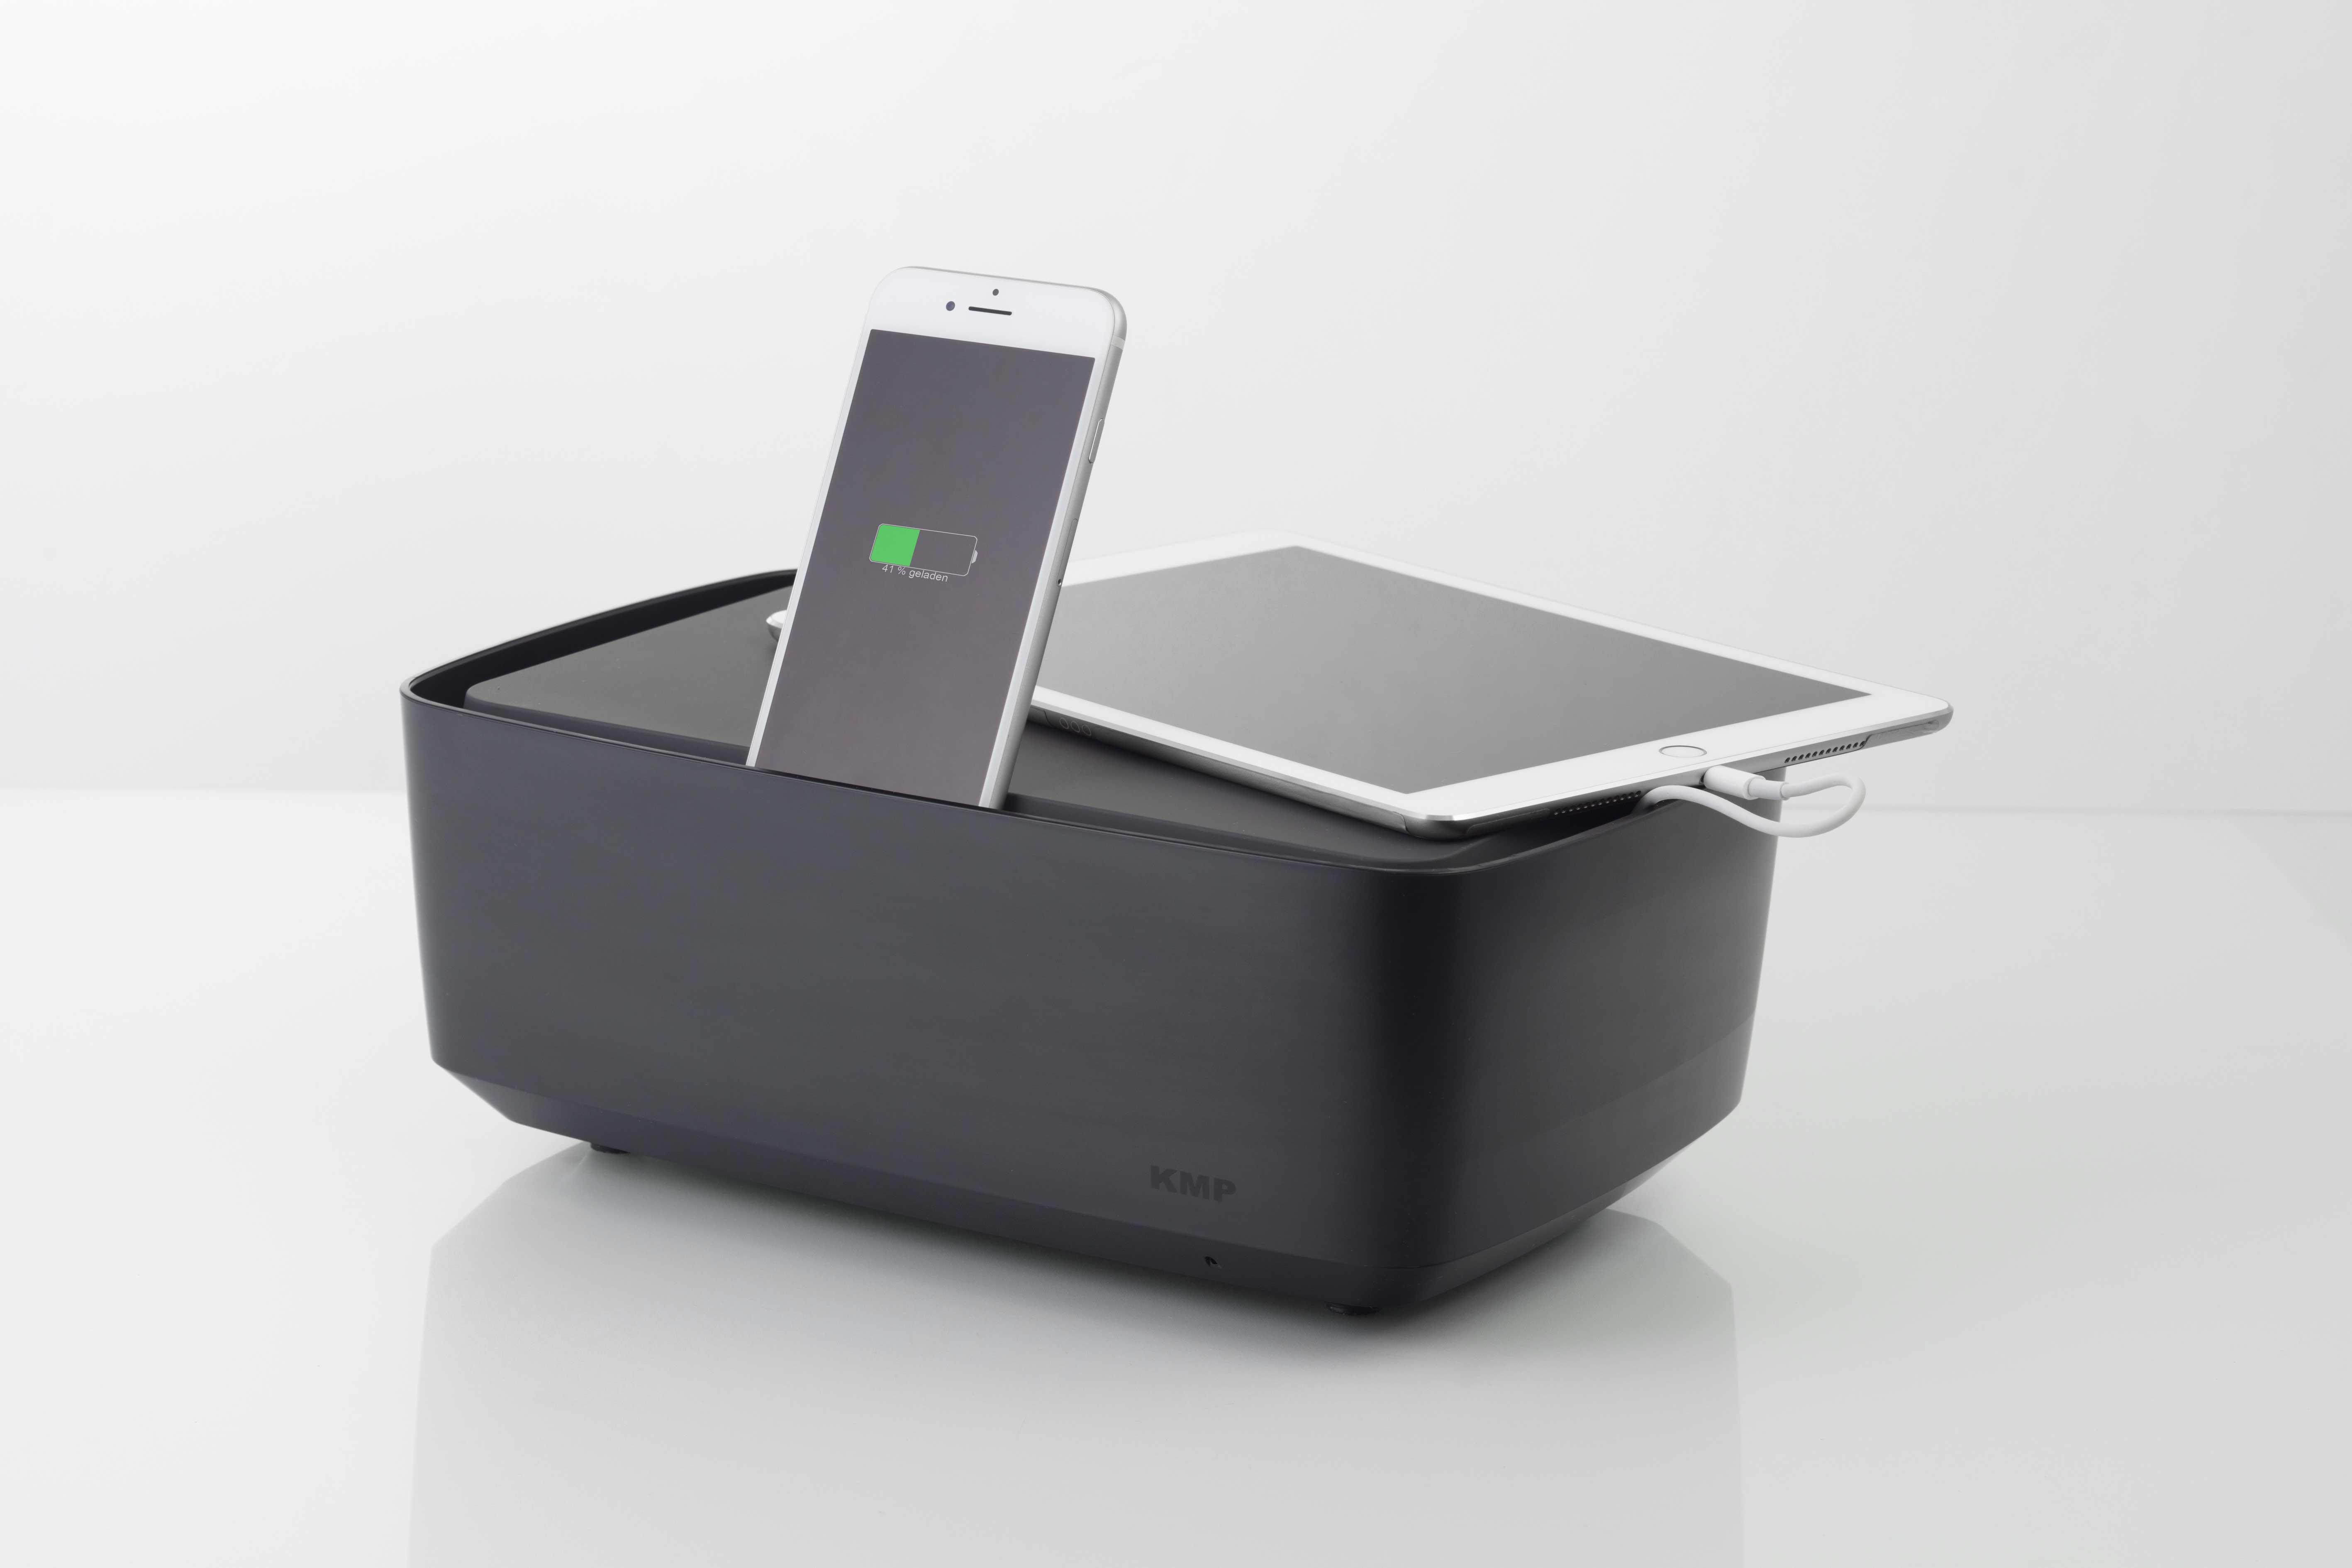 KMP Protective Box Ladestation für iPad, iPhone, schwarz